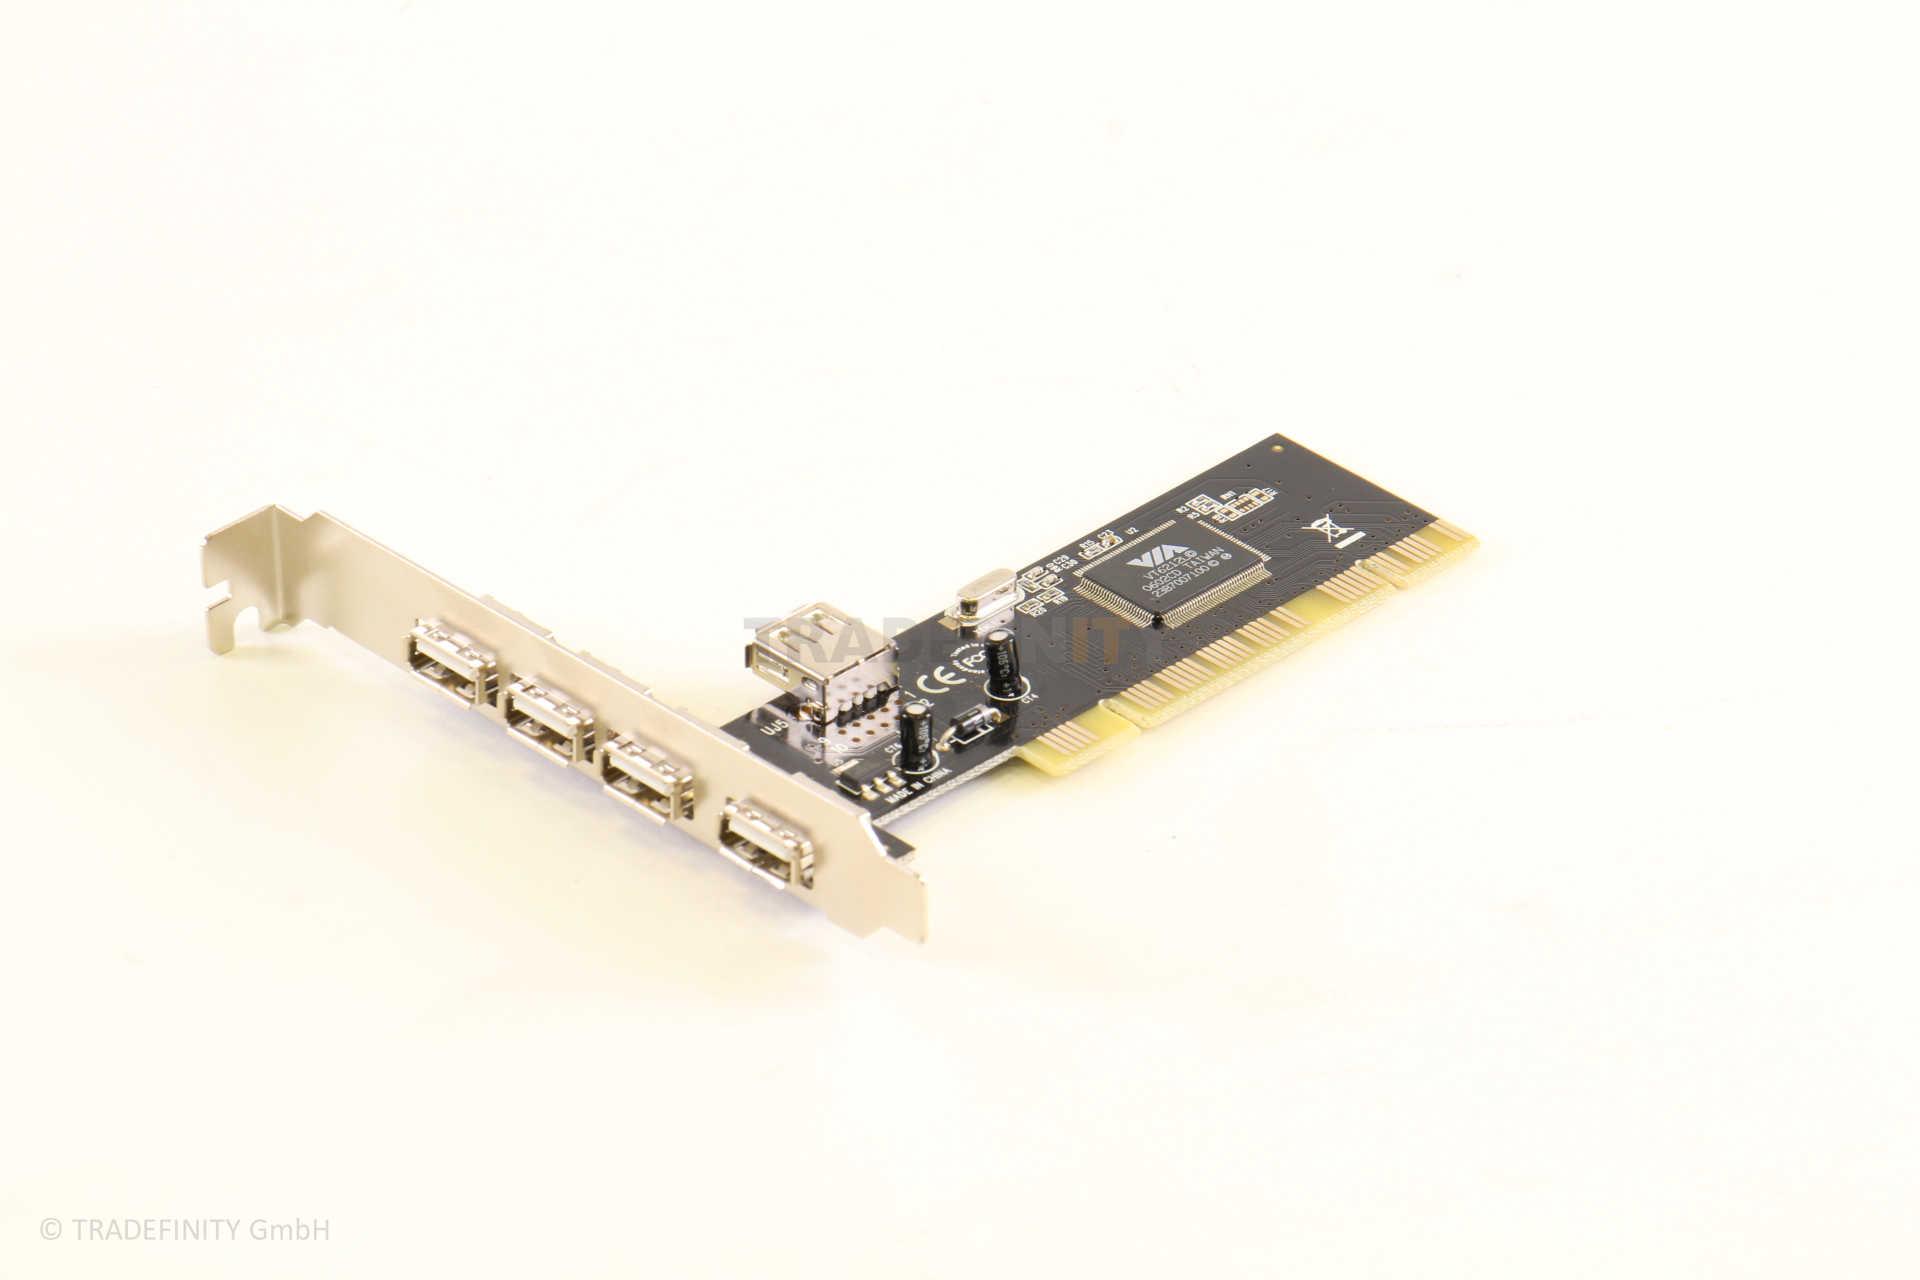 5-Port USB 2.0 Adapter